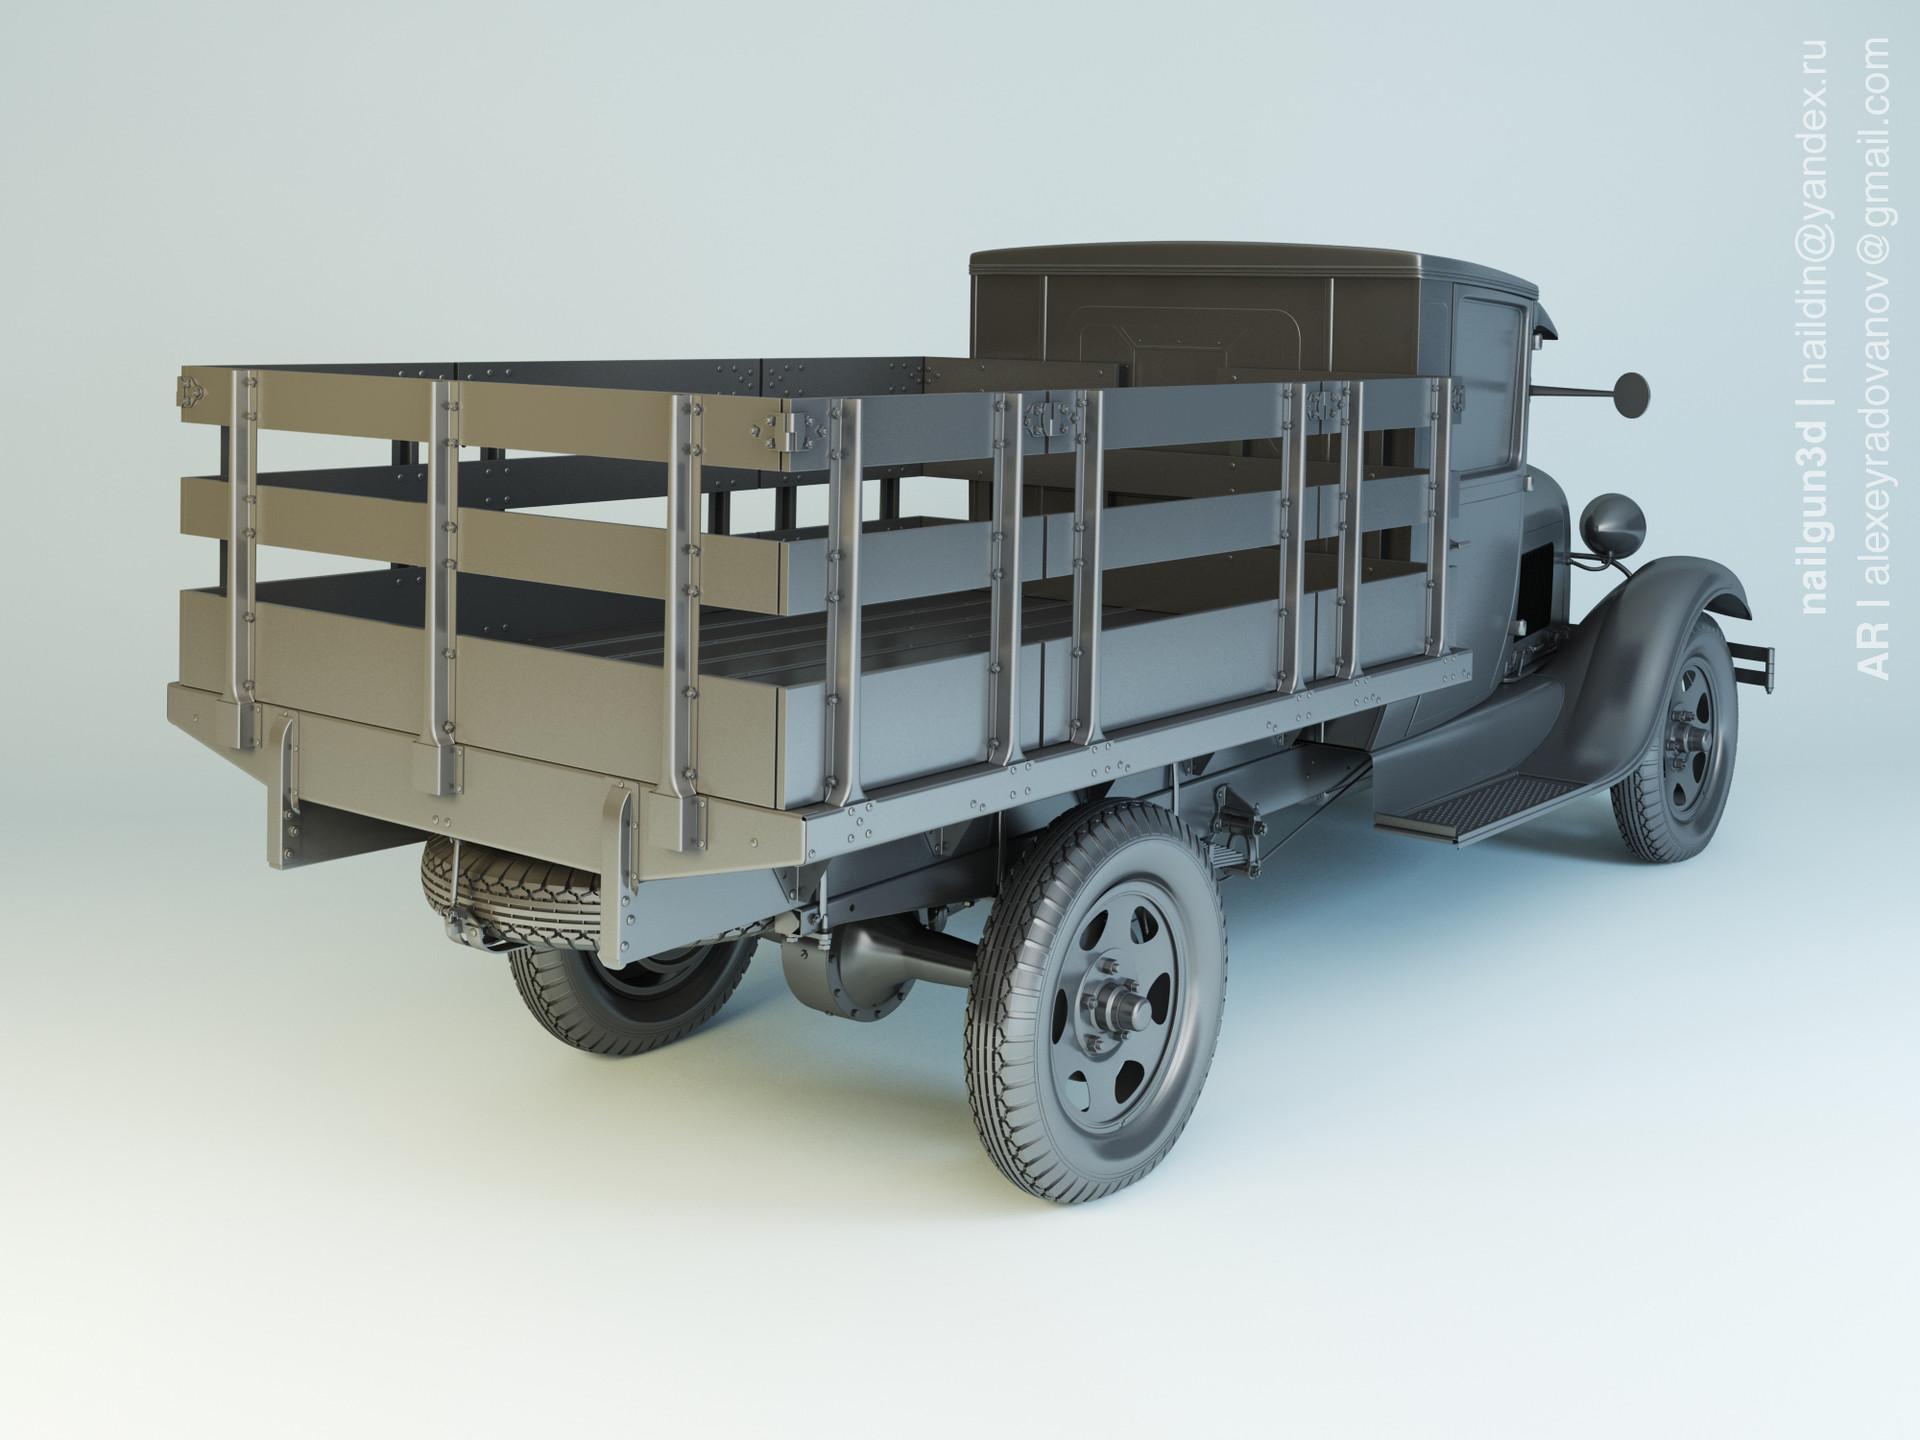 Nail khusnutdinov als 222 003 ford aa 1929 modelling 1